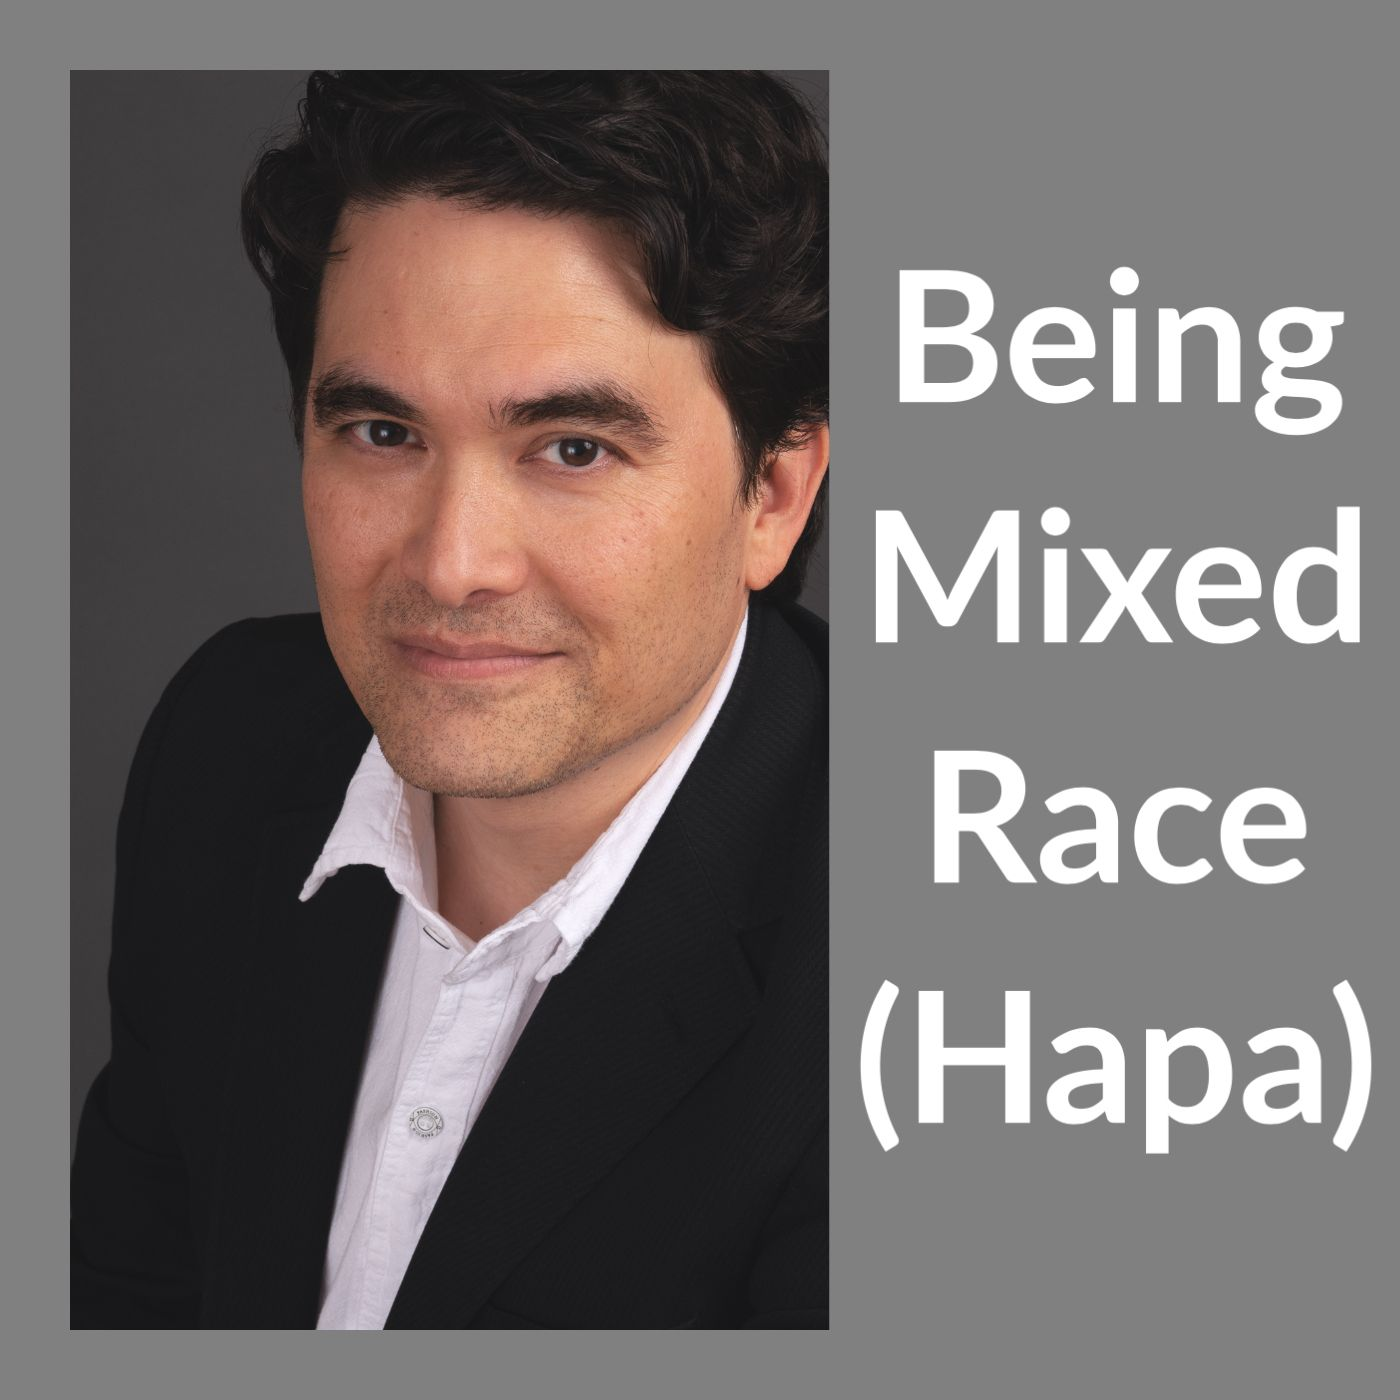 Being Mixed Race (Hapa)